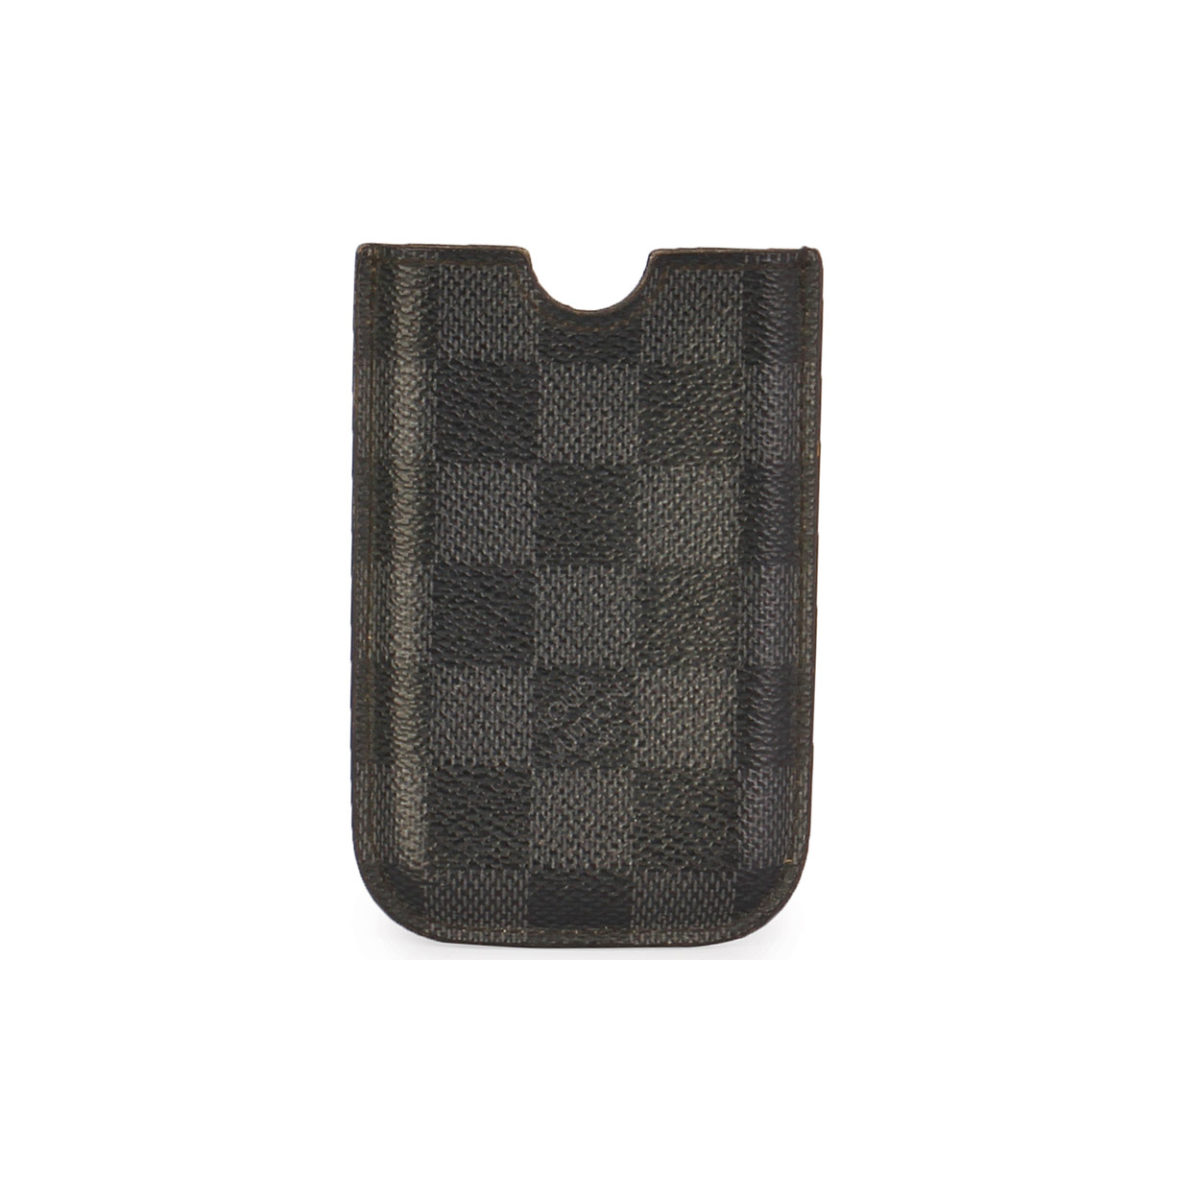 newest c6460 dc620 LOUIS VUITTON Damier Graphite iPhone 5/5S Cover